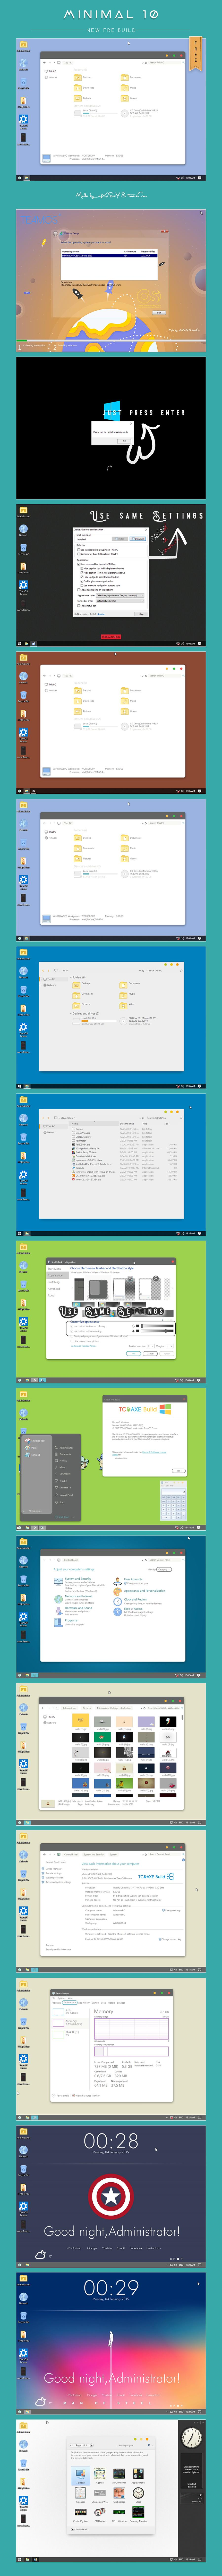 Minimal 10 Slim Multilang Windows10 Rs5 X64 Tc Axe Build Tc Axe Os World